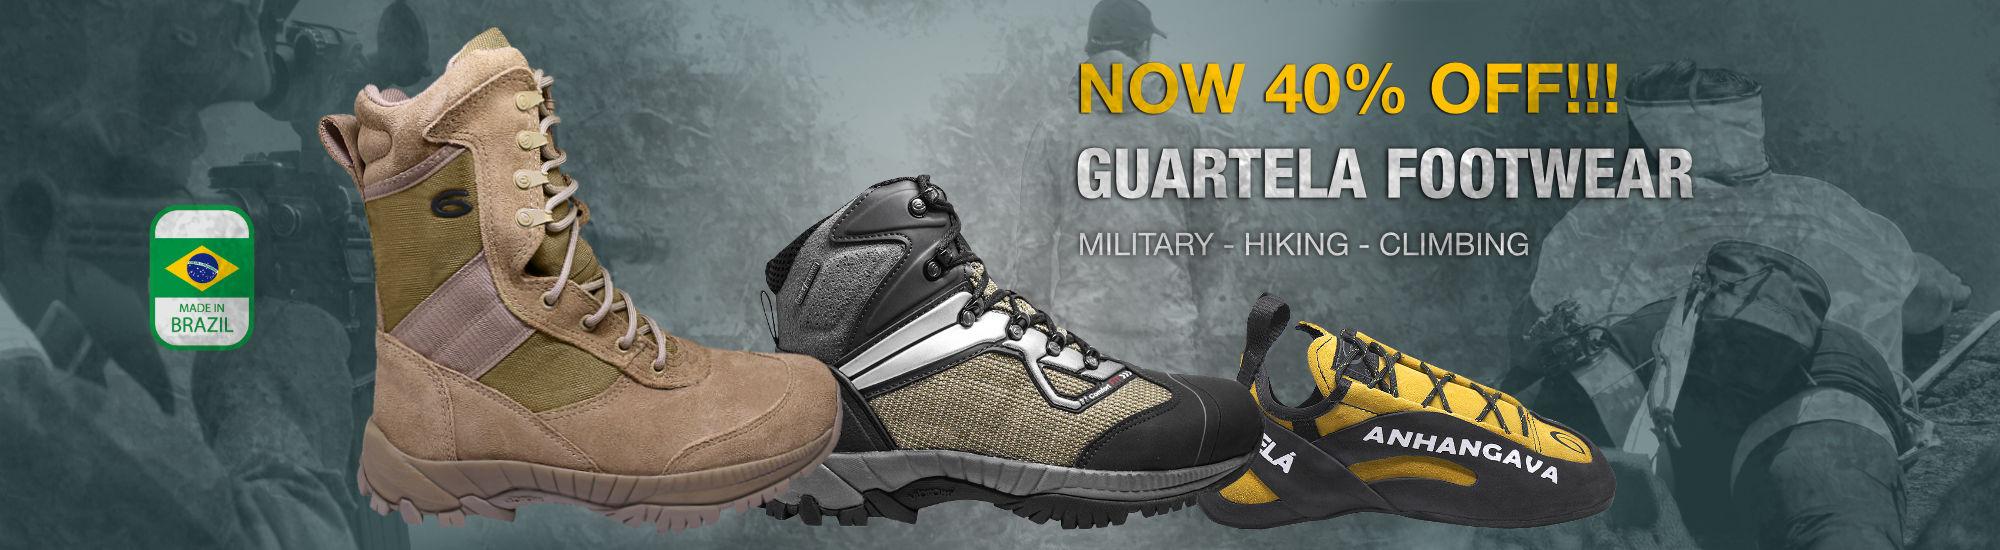 Military Hiking Climbing Footwear